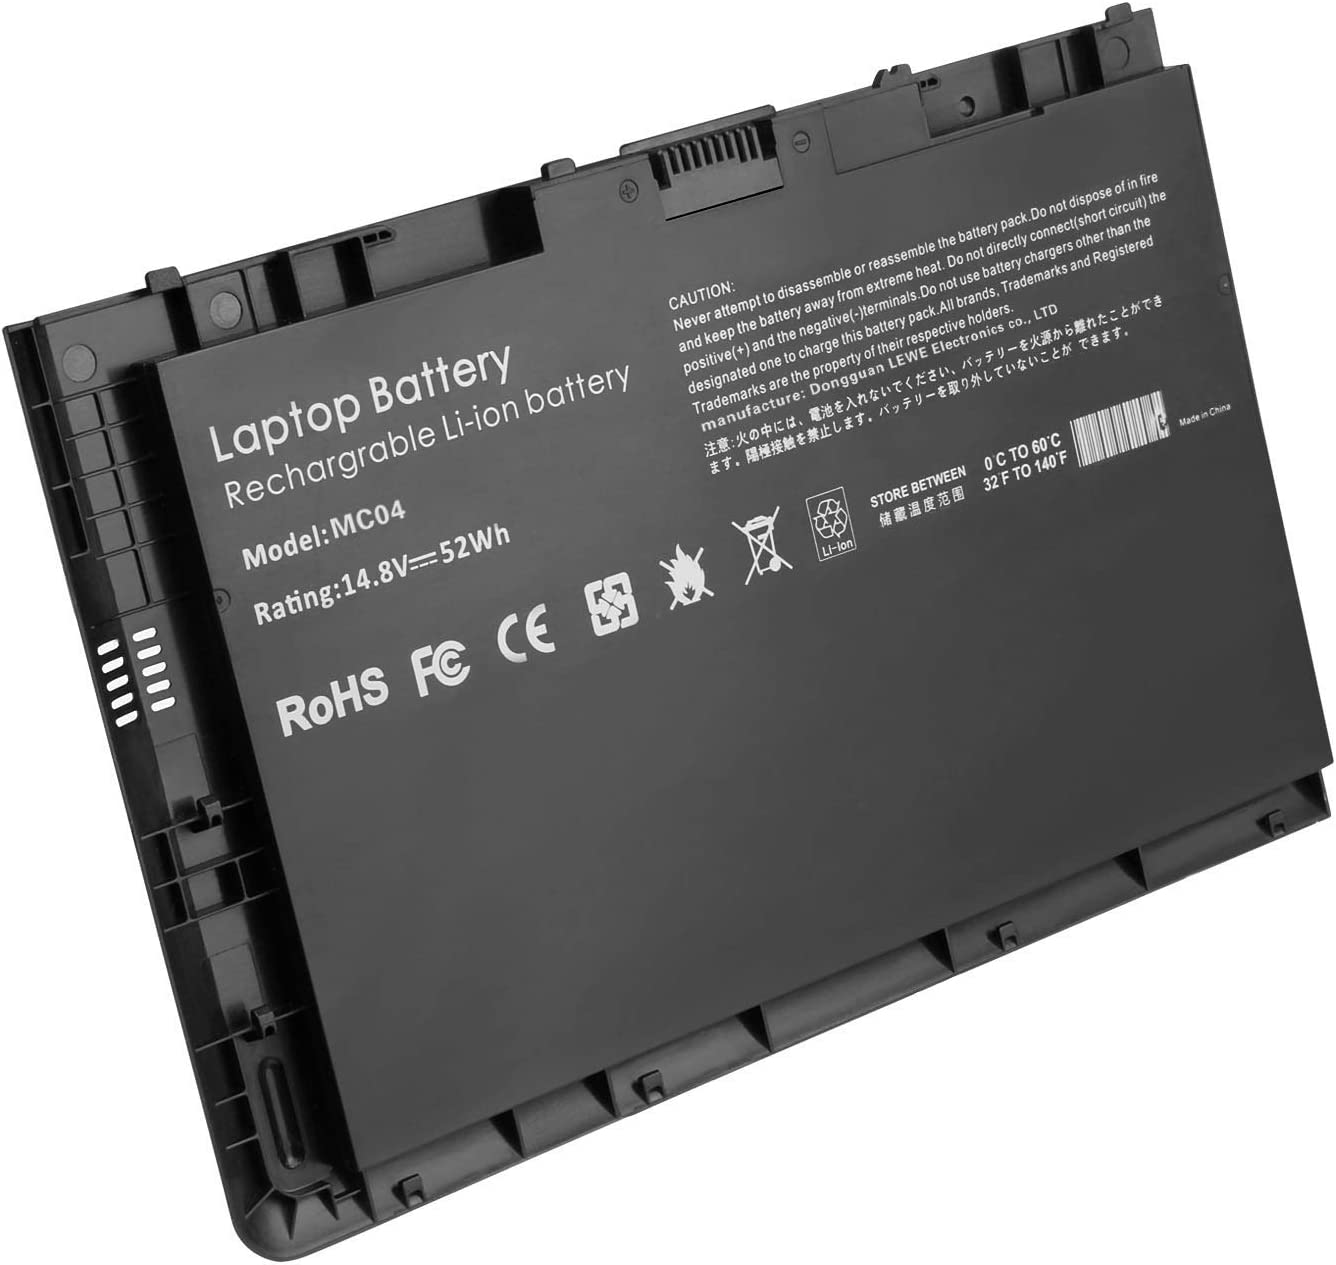 14.8V 3600mAh Replacement Battery BT04XL for HP EliteBook Folio 9470 9470M 687945-001 687517-171 HSTNN-IB3